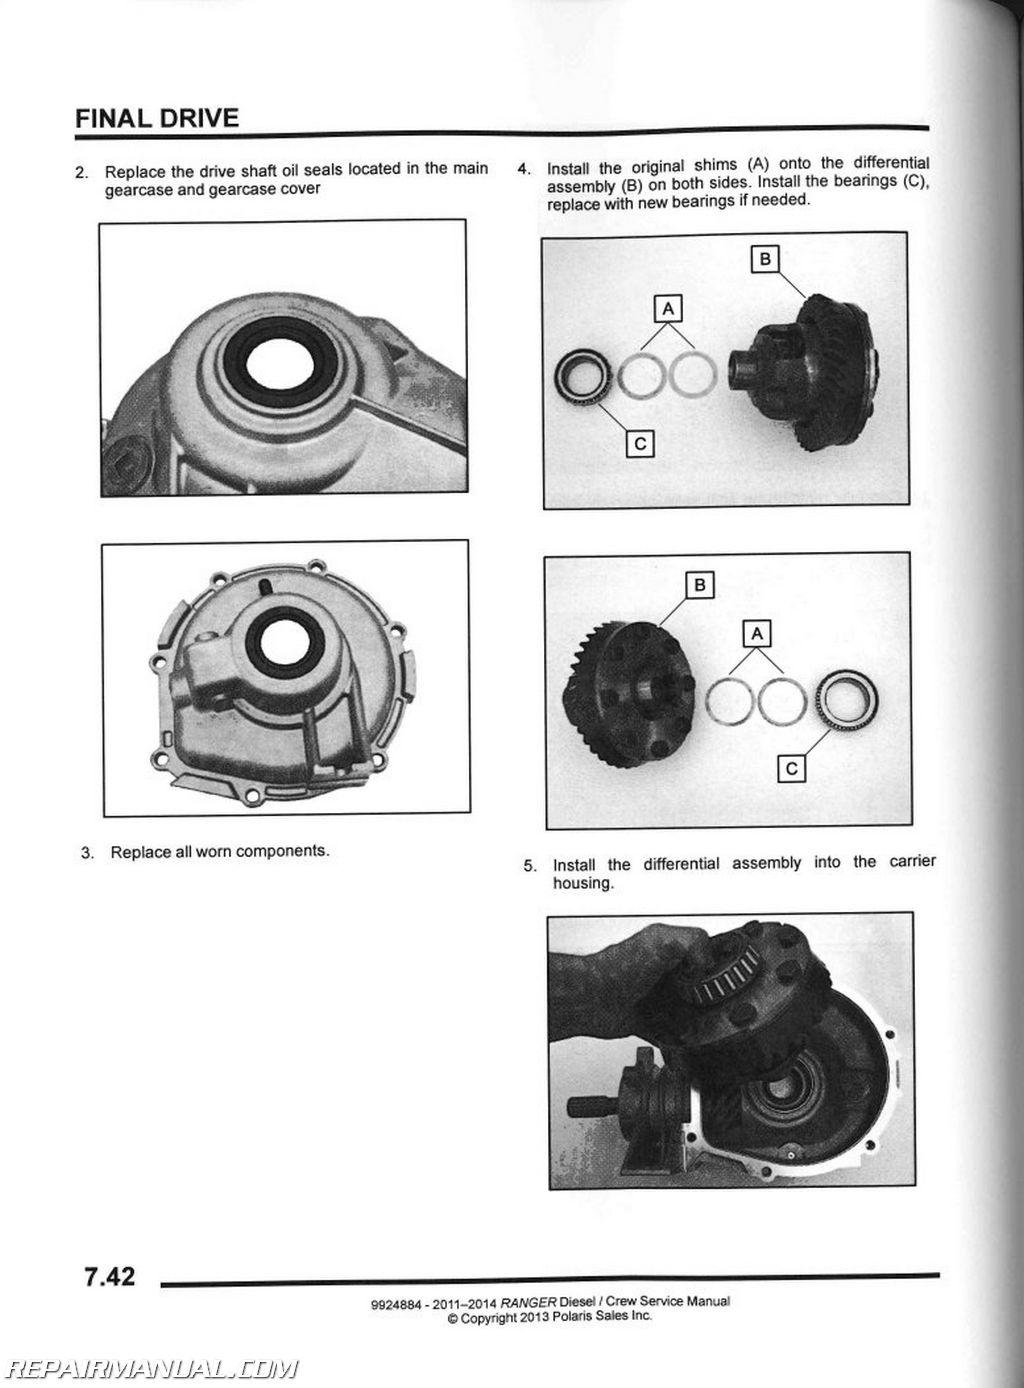 hight resolution of 2011 2014 polaris ranger diesel crew utv service manual 2012 polaris ranger crew 800 wiring diagram 2013 polaris ranger wiring schematics